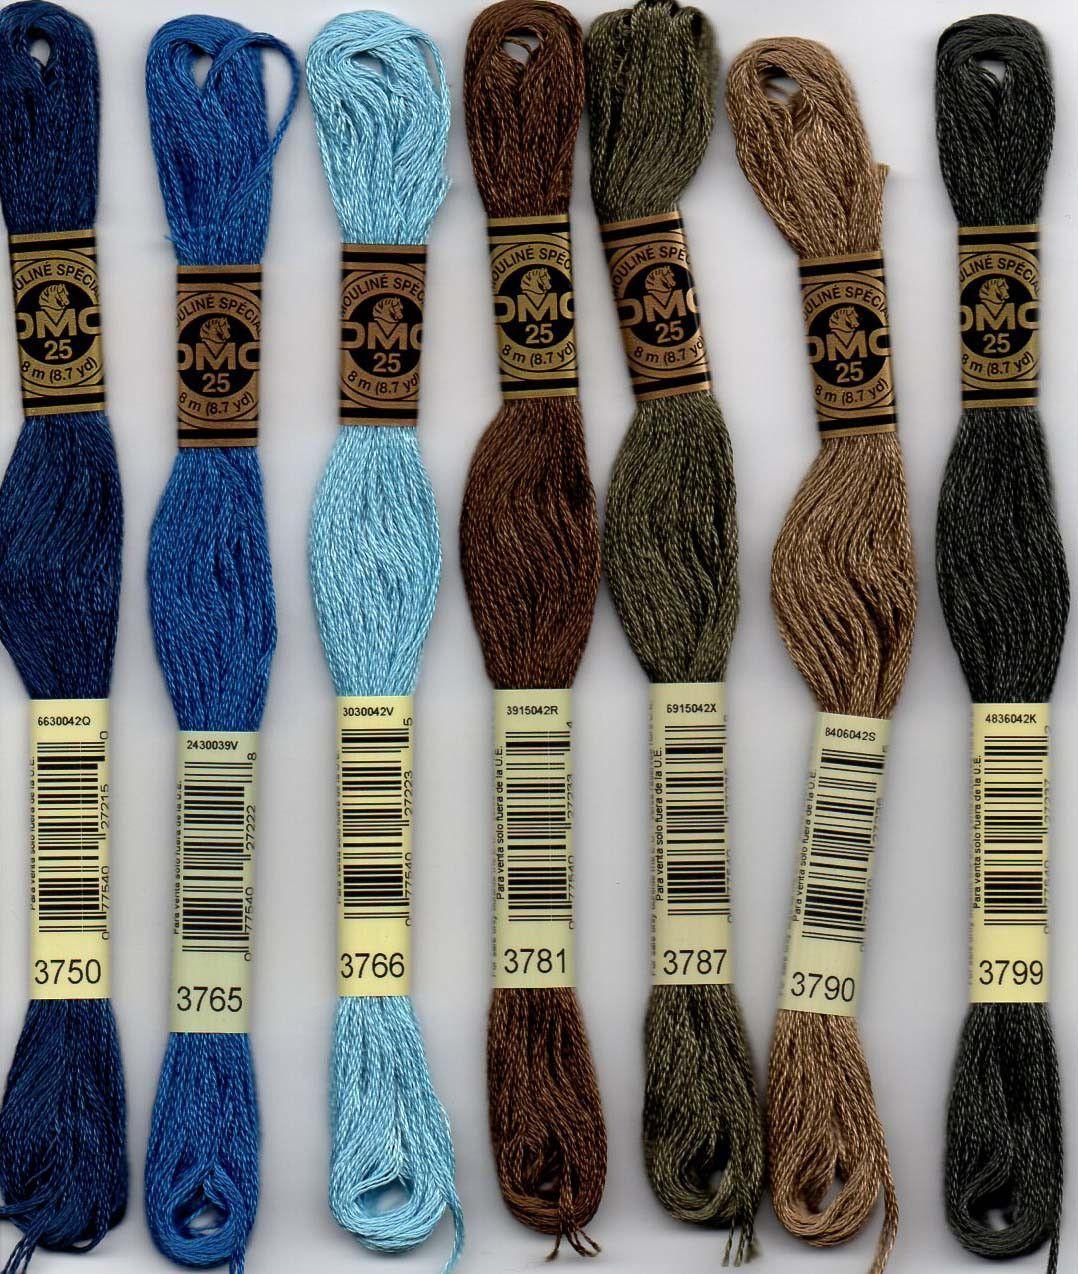 Dmc embroidery floss 3700 series dmc embroidery floss dmc embroidery floss 3700 series nvjuhfo Images